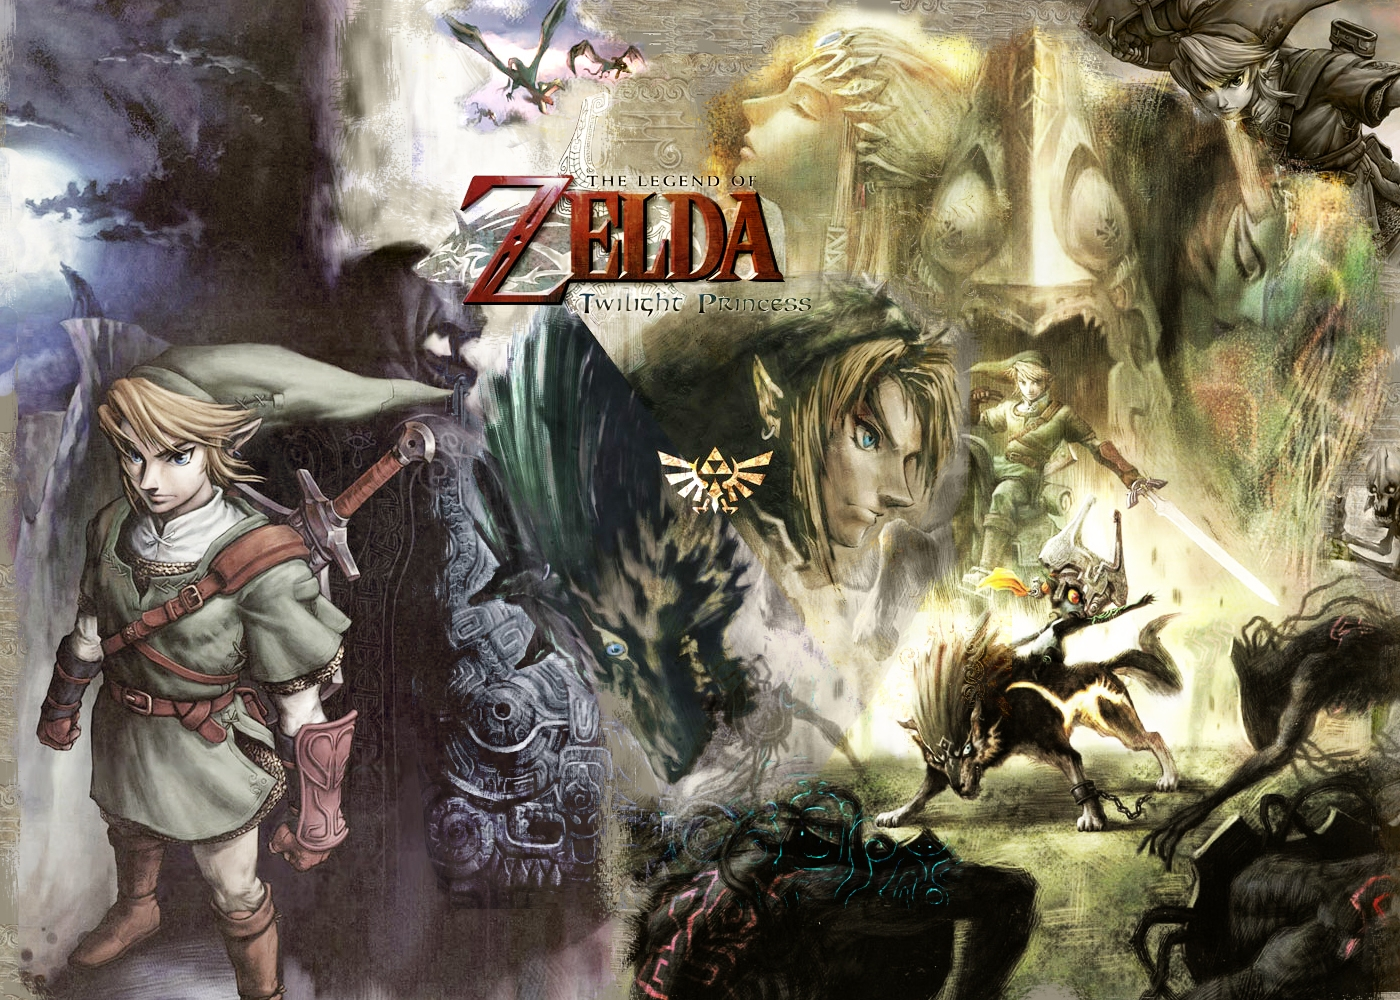 Free Download Pics Photos Twilight Princess The Legend Zelda